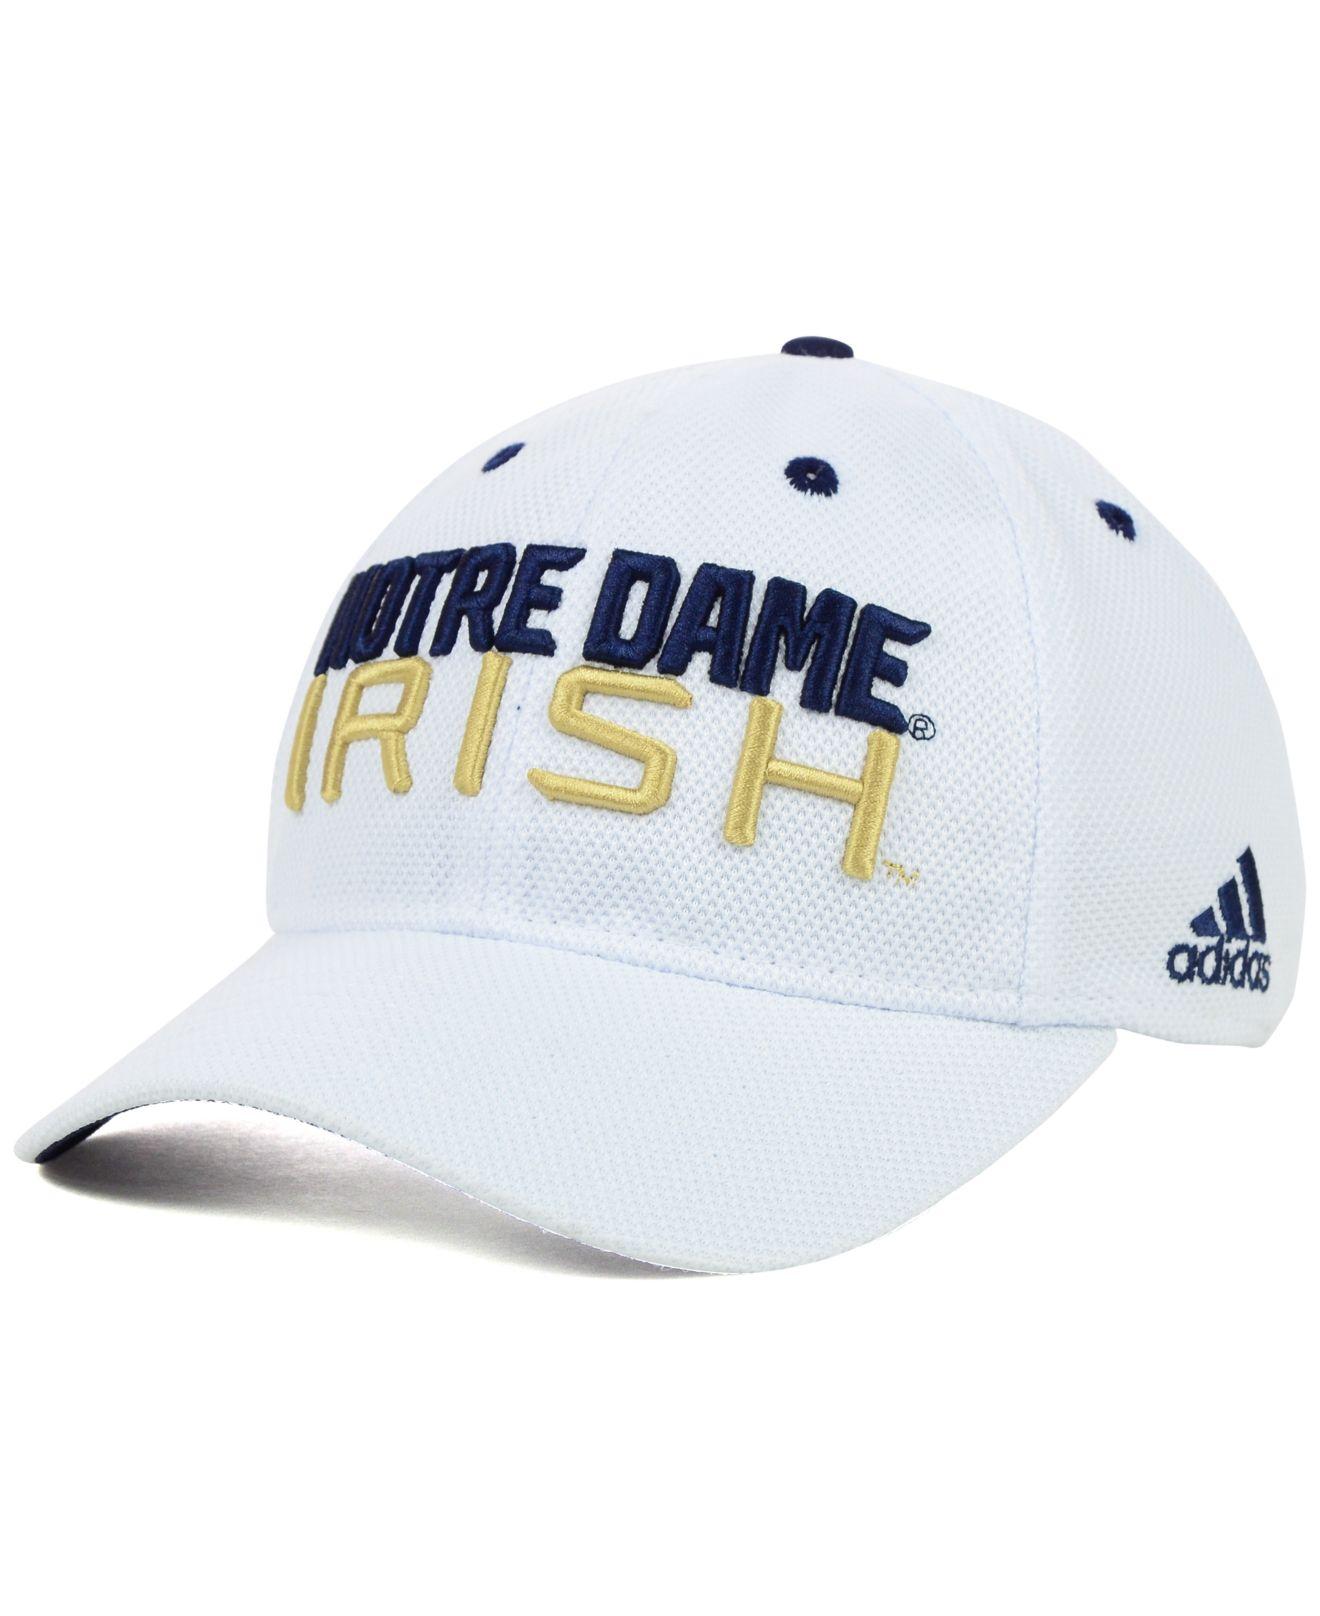 2632ea6bba9fc ... wholesale lyst adidas notre dame fighting irish campus slope flex cap  in white for men 846b7